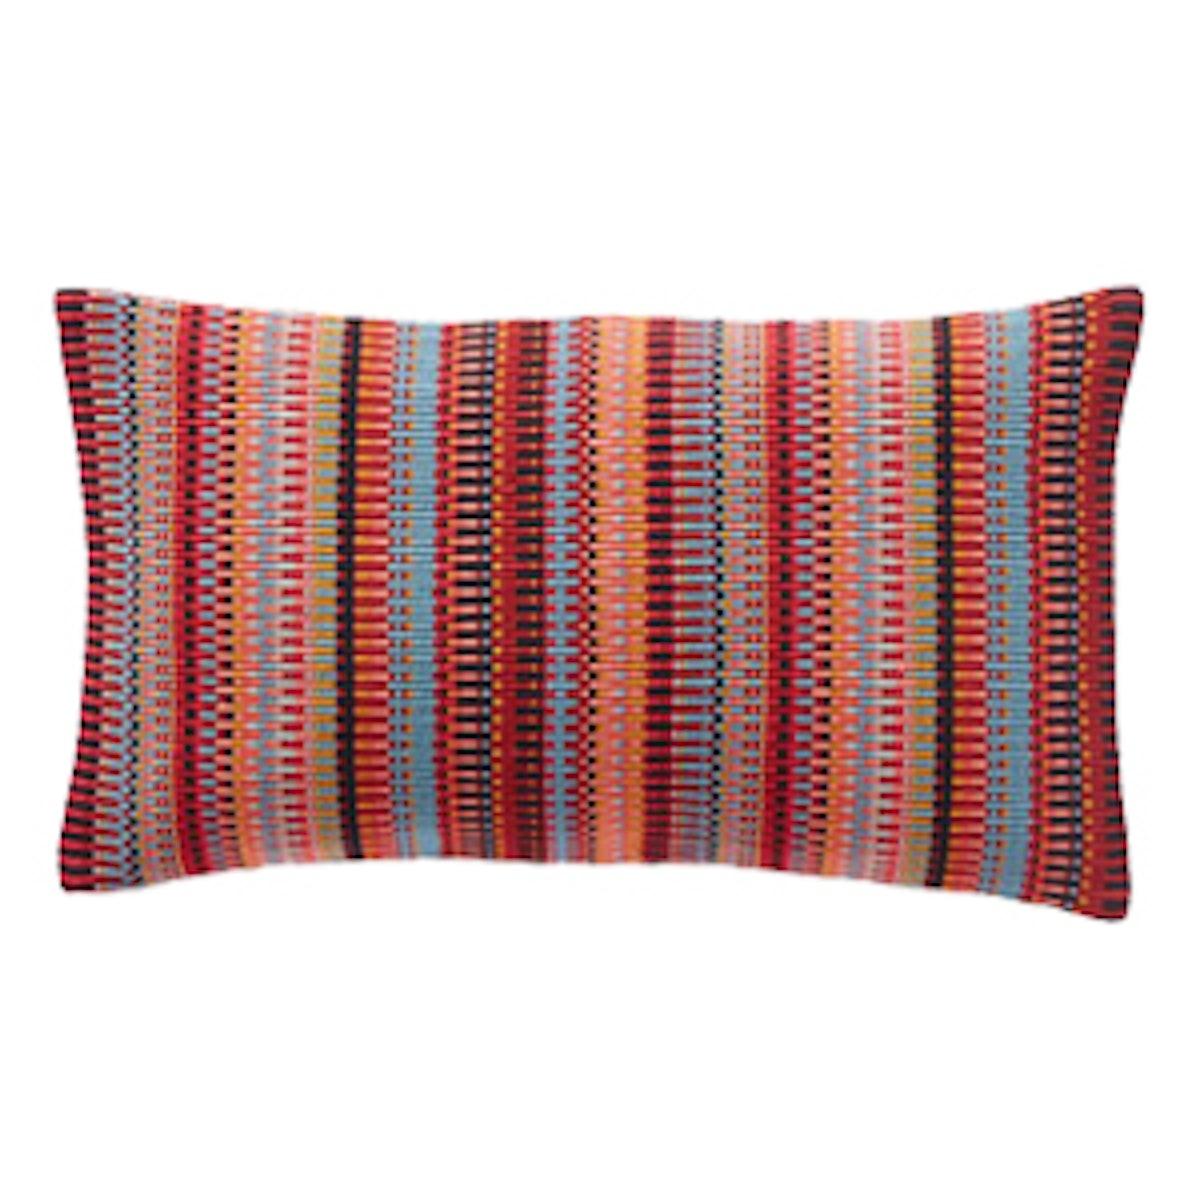 Margo Selby Mini Blocks Pillow Cover